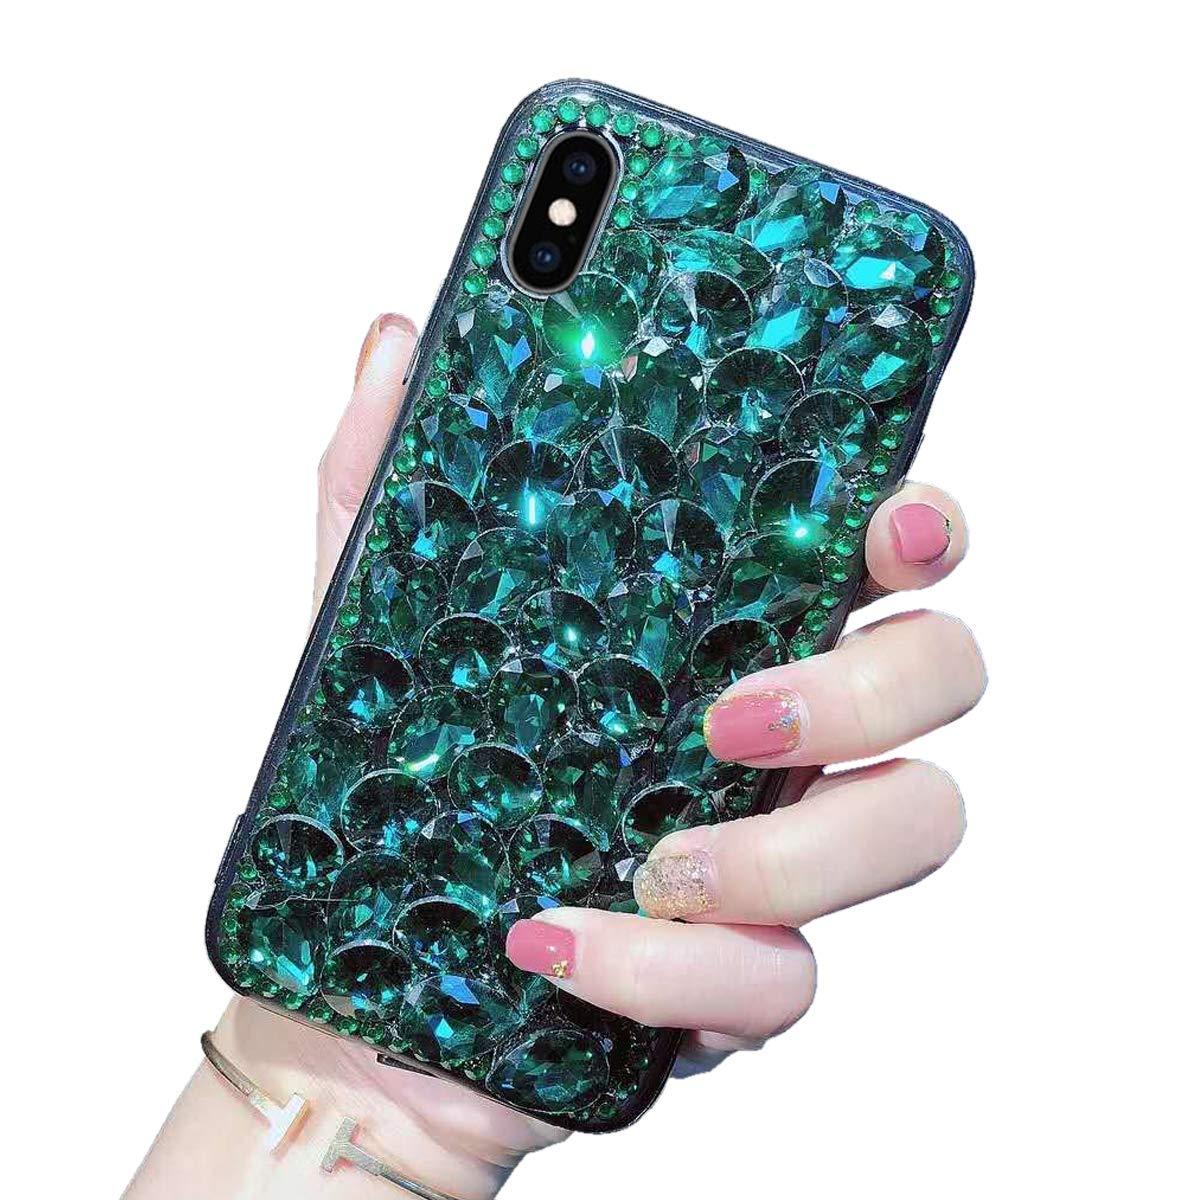 Luxus Glitzer Hü lle fü r iPhone 7/ iPhone 8, Misstars 3D Bling Diamant Handyhü lle Transparent Hart PC Rü ckschale mit Silikon TPU Rahmen Schutzhü lle fü r Apple iPhone 7/8 (4,7 Zoll), Silber